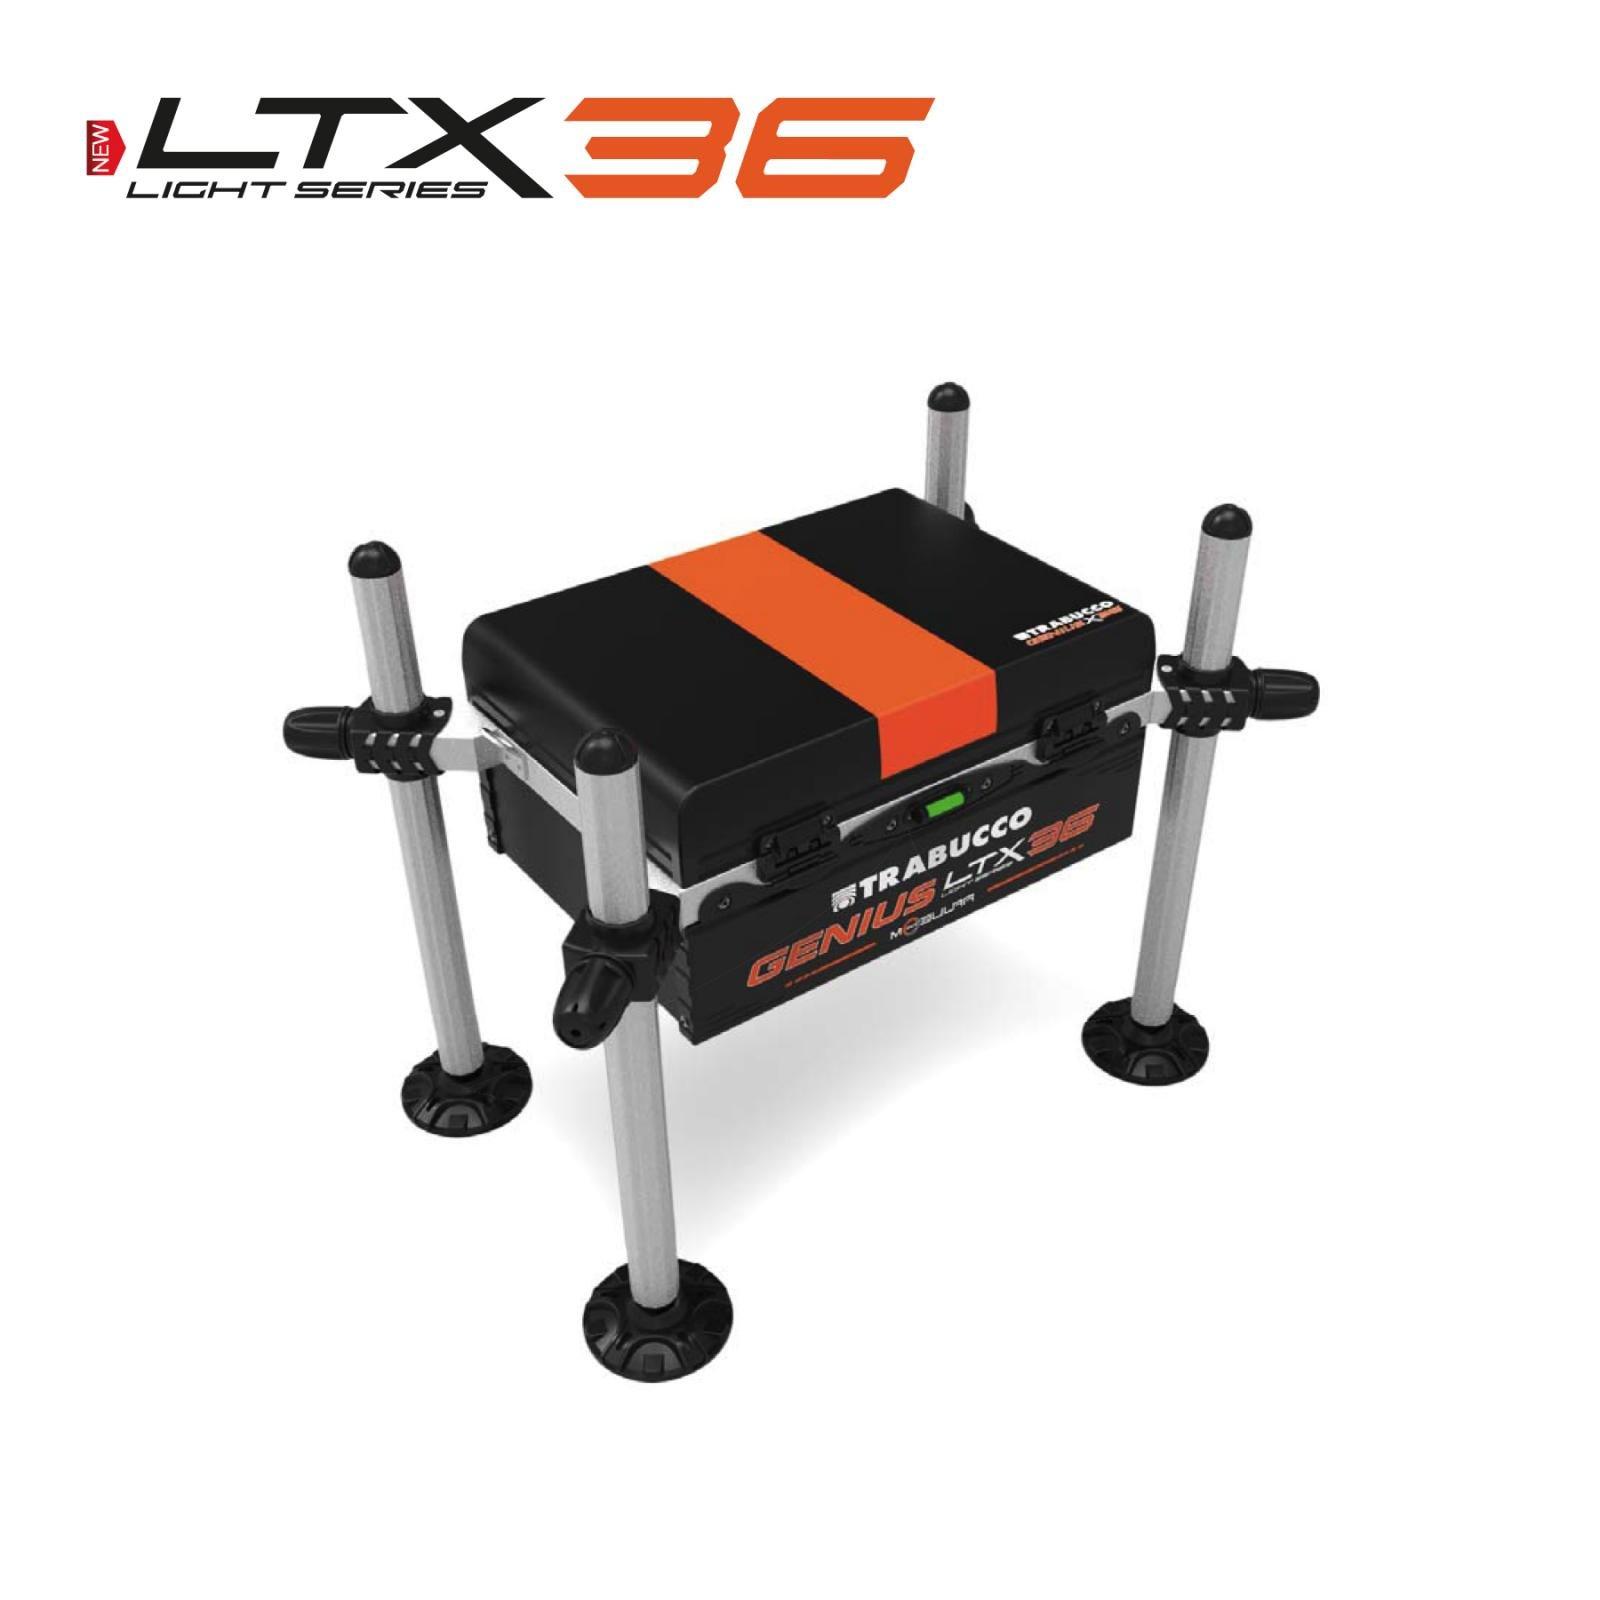 Trabucco LTX 36